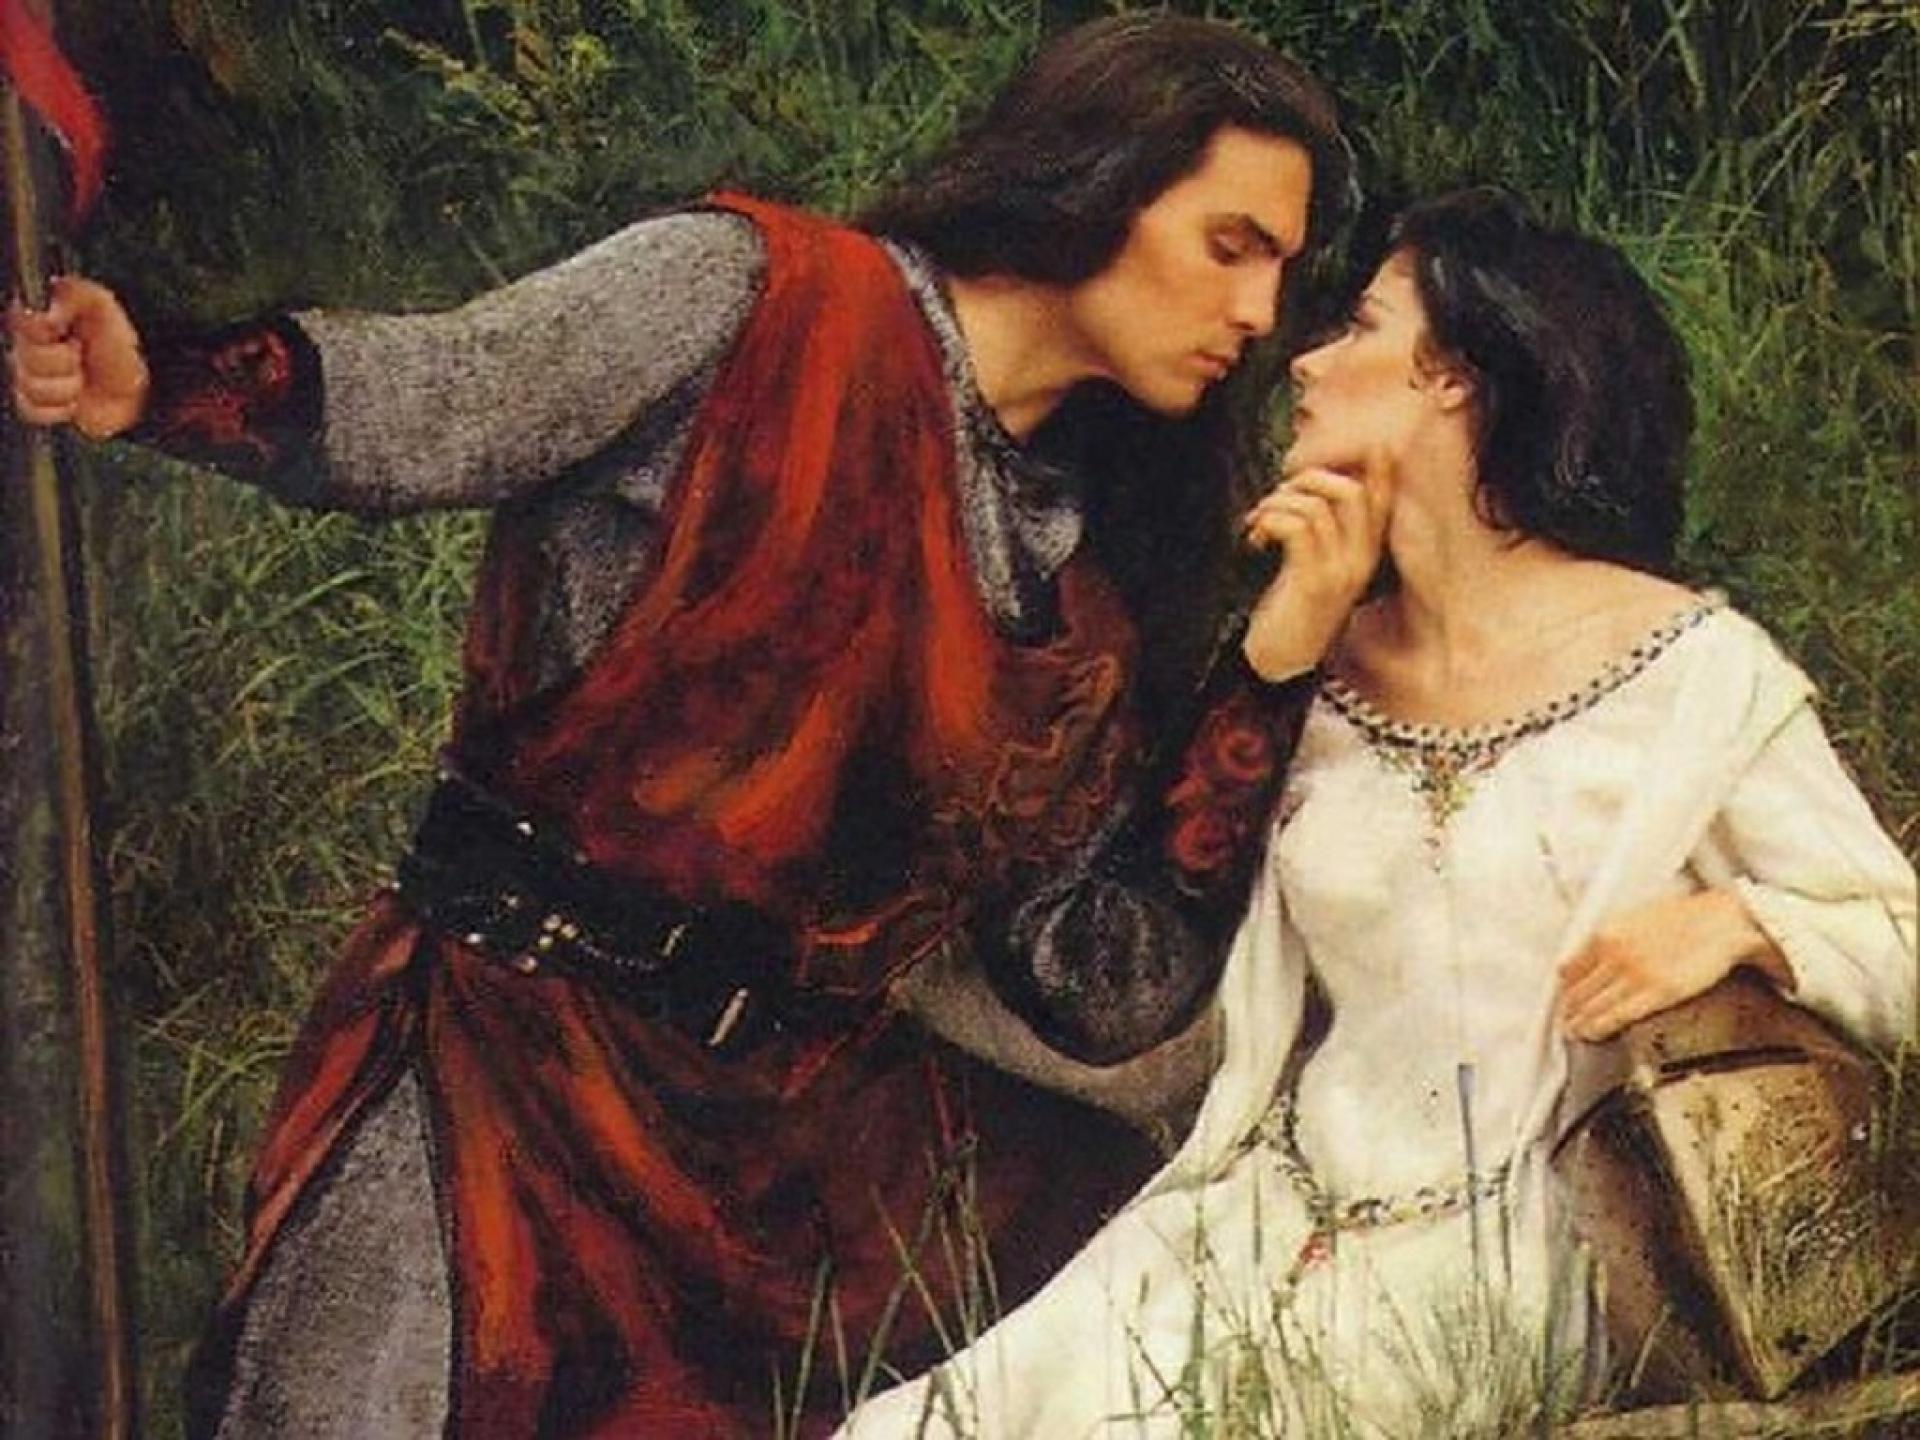 kiss_love_Charming_The_Prince__1920x1440_wallpaperhi.com